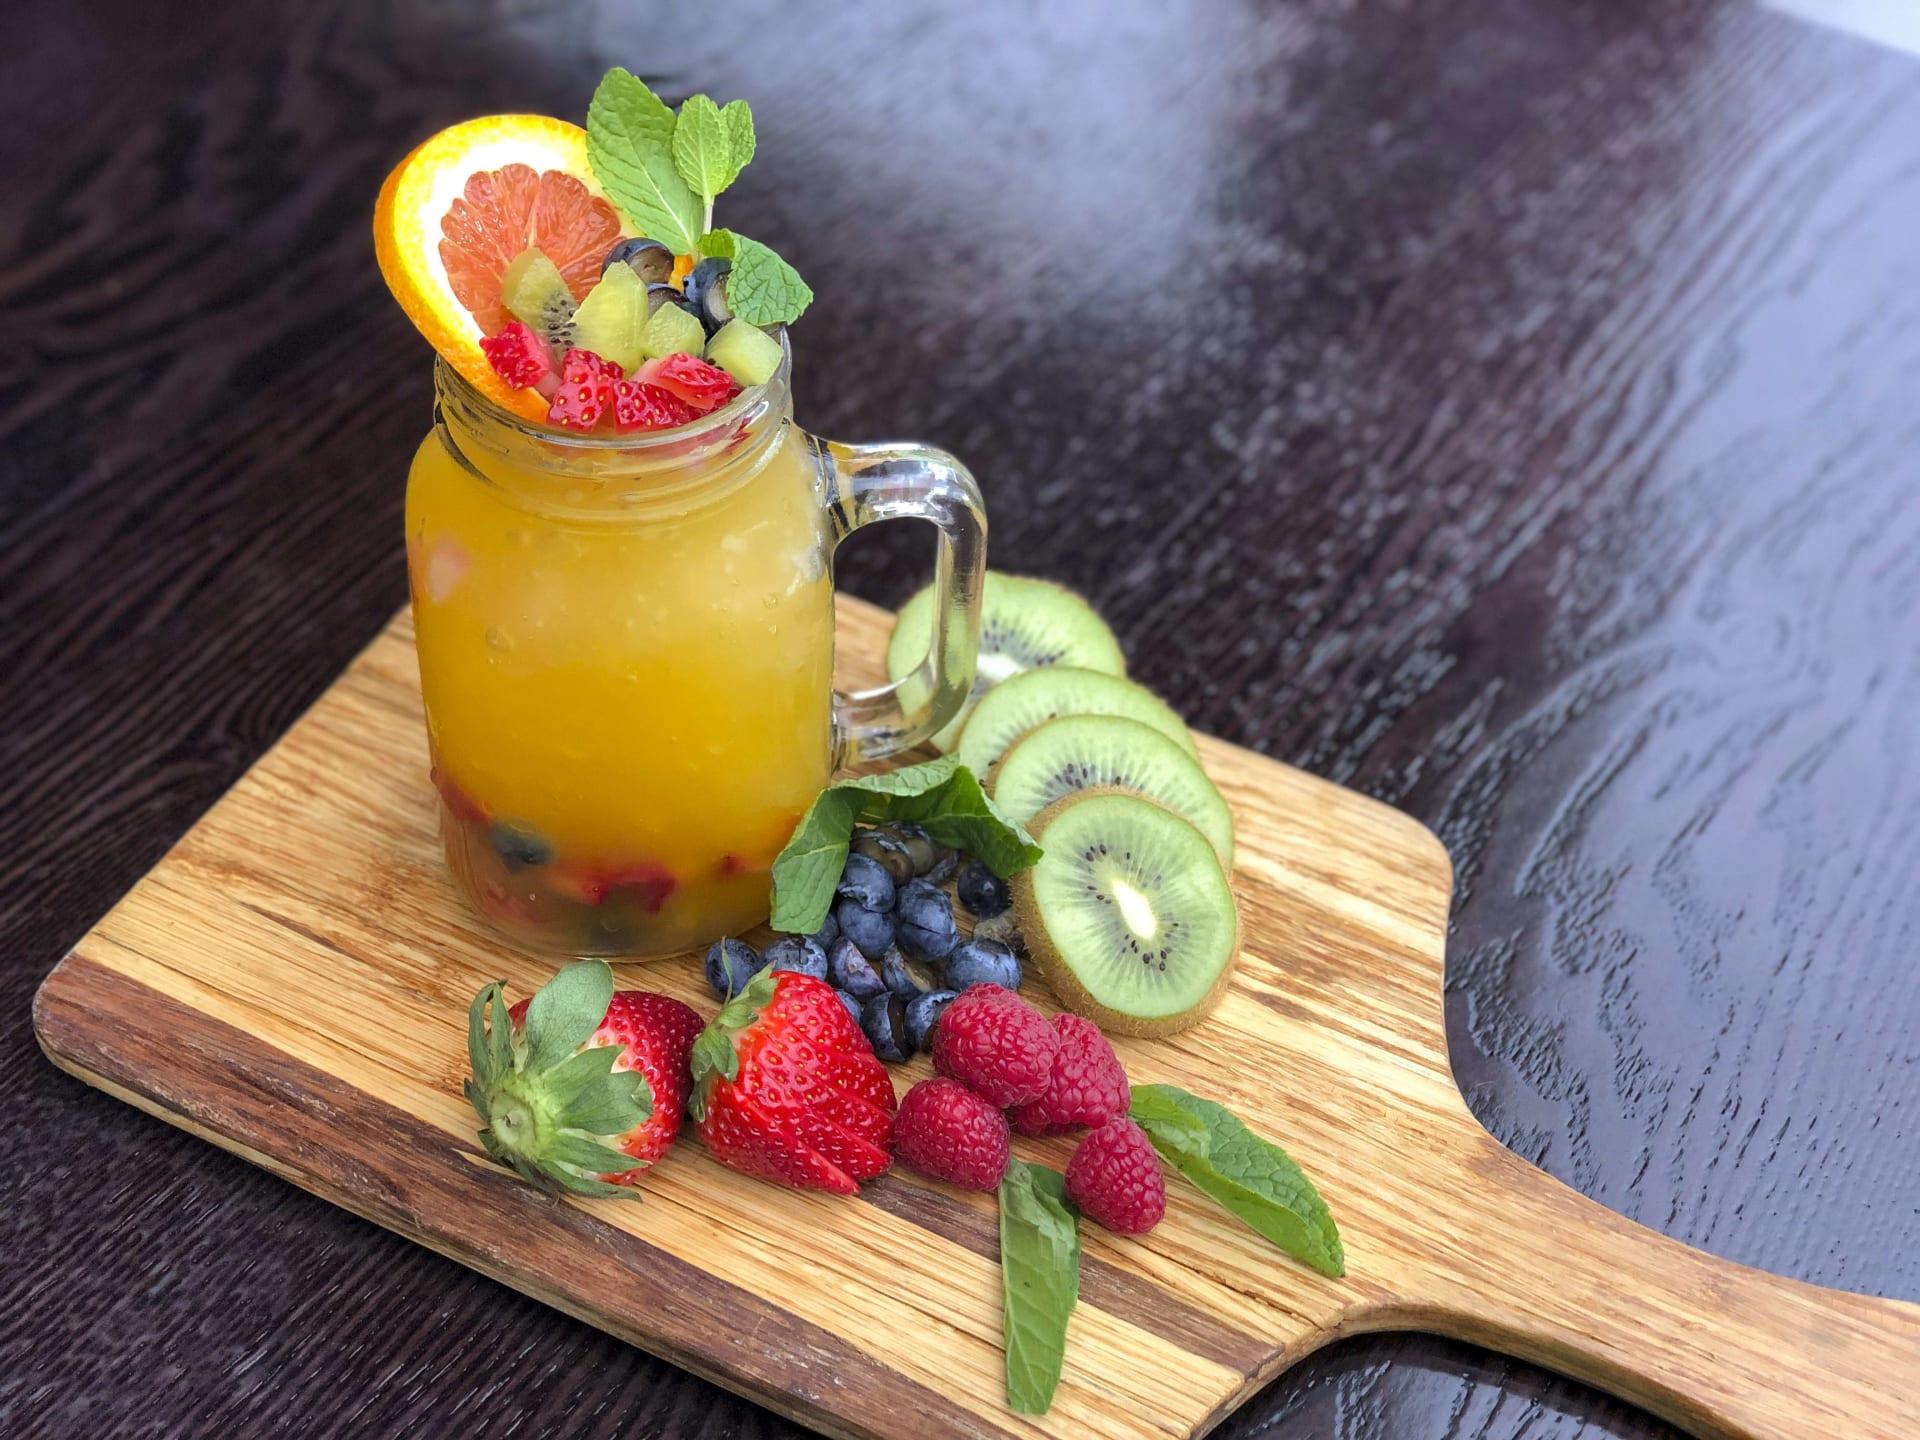 fruity drink on a cutting board